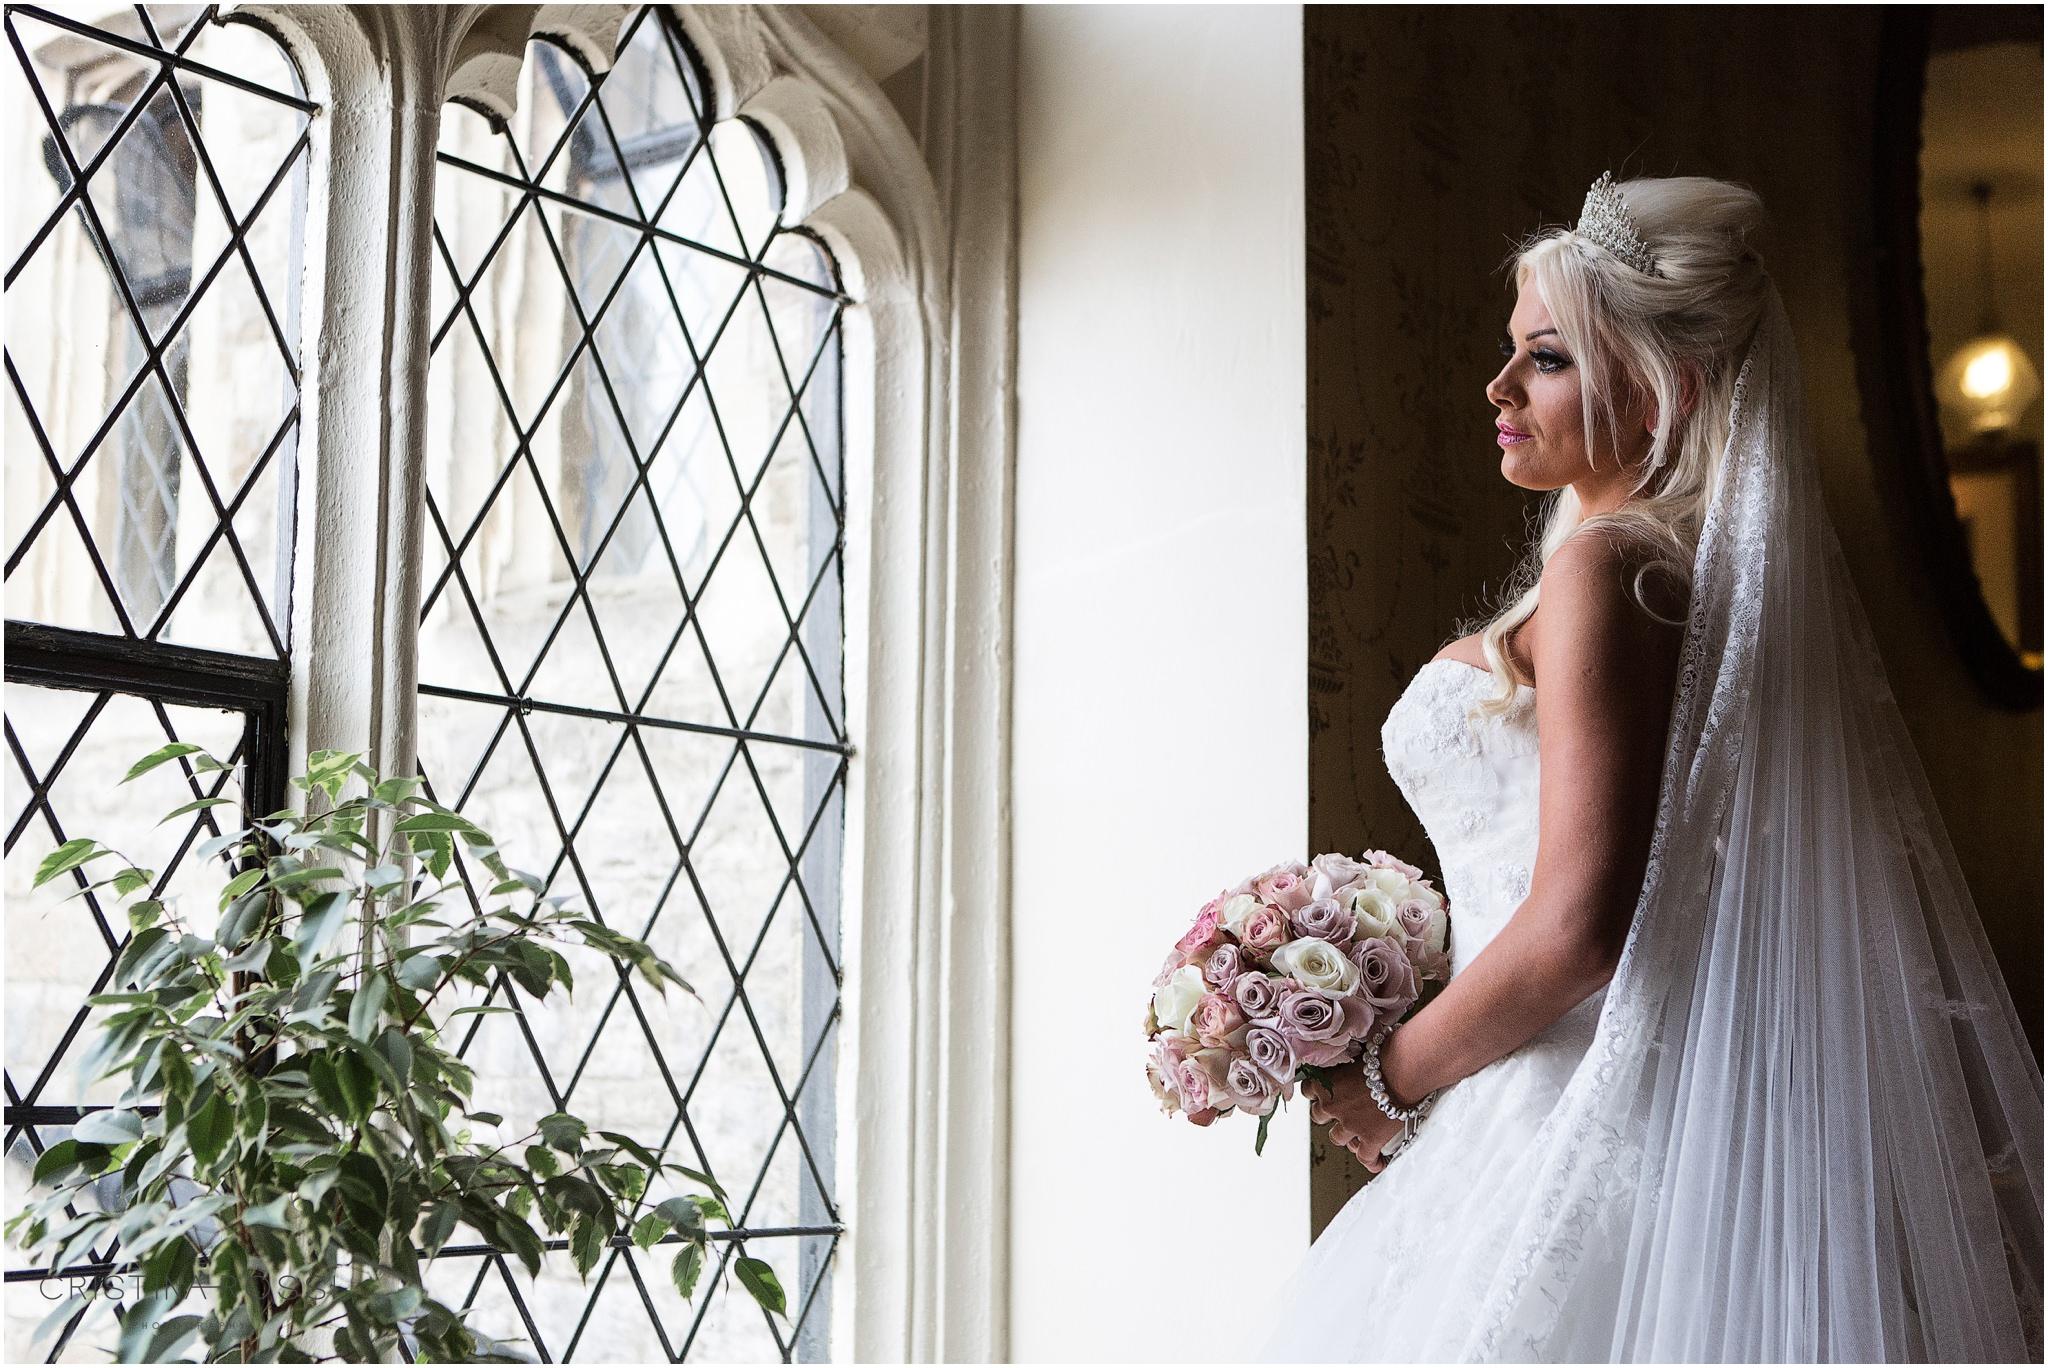 Eastwell Manor Neil Razor Ruddock & Leah Newman wedding_0079